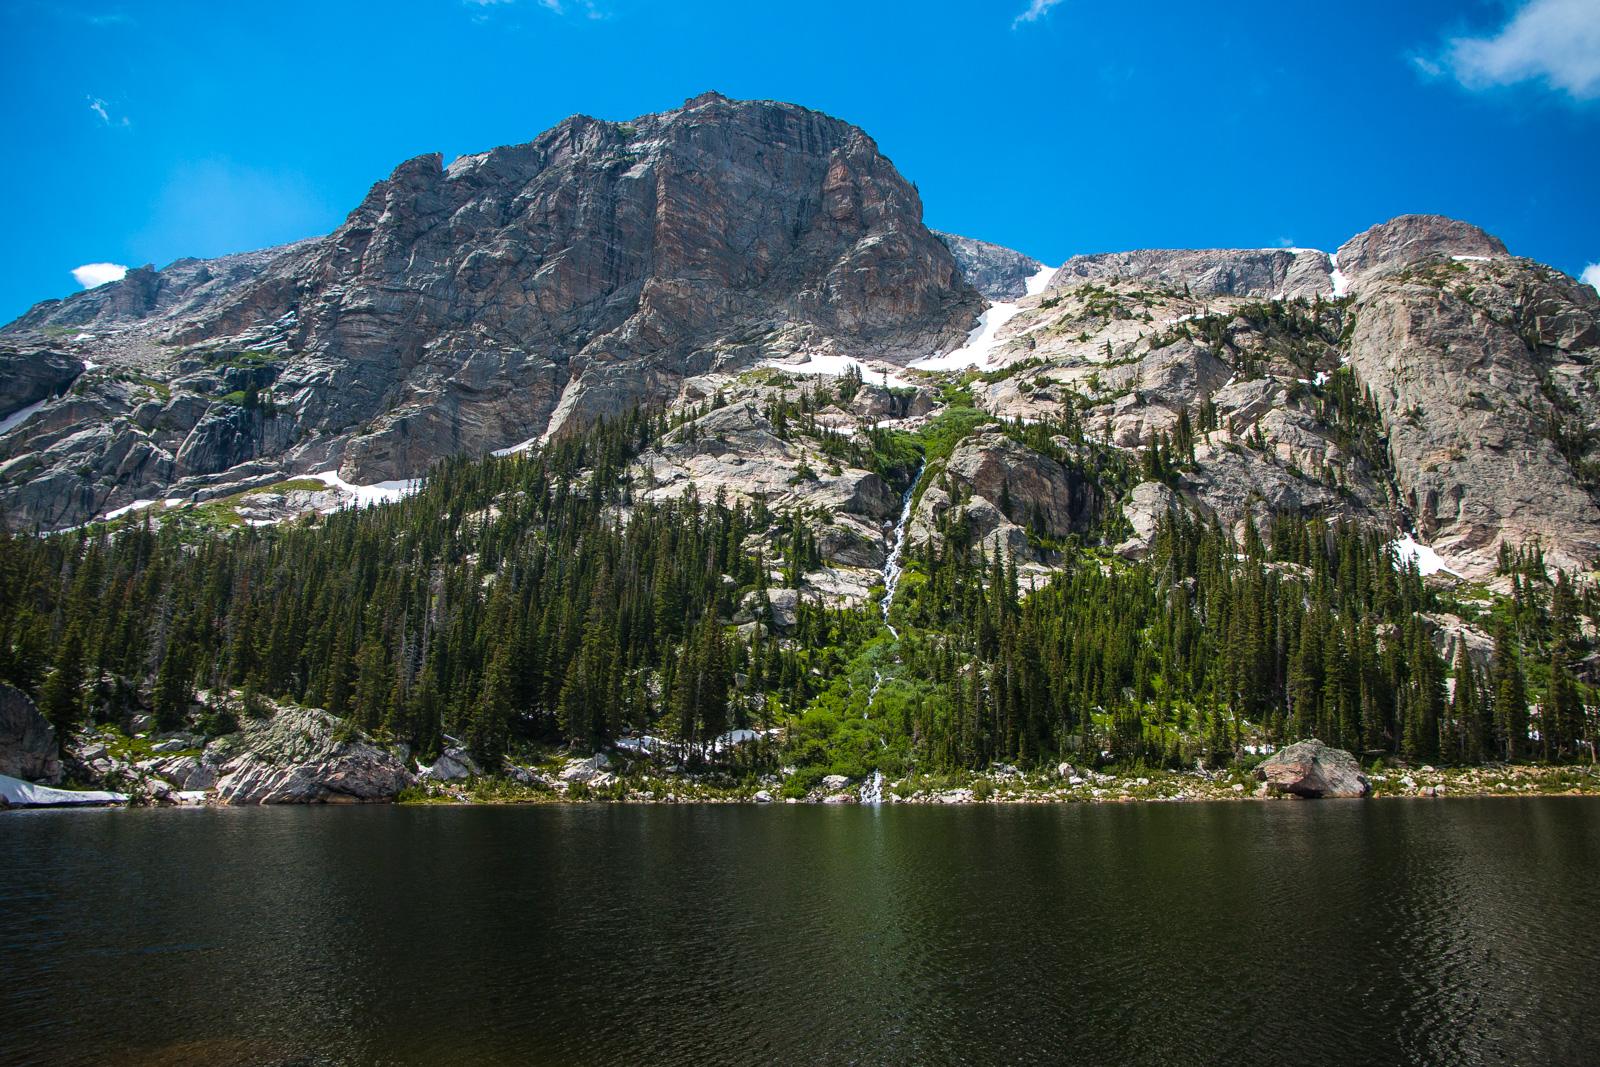 Copeland Mountain and Pear Lake